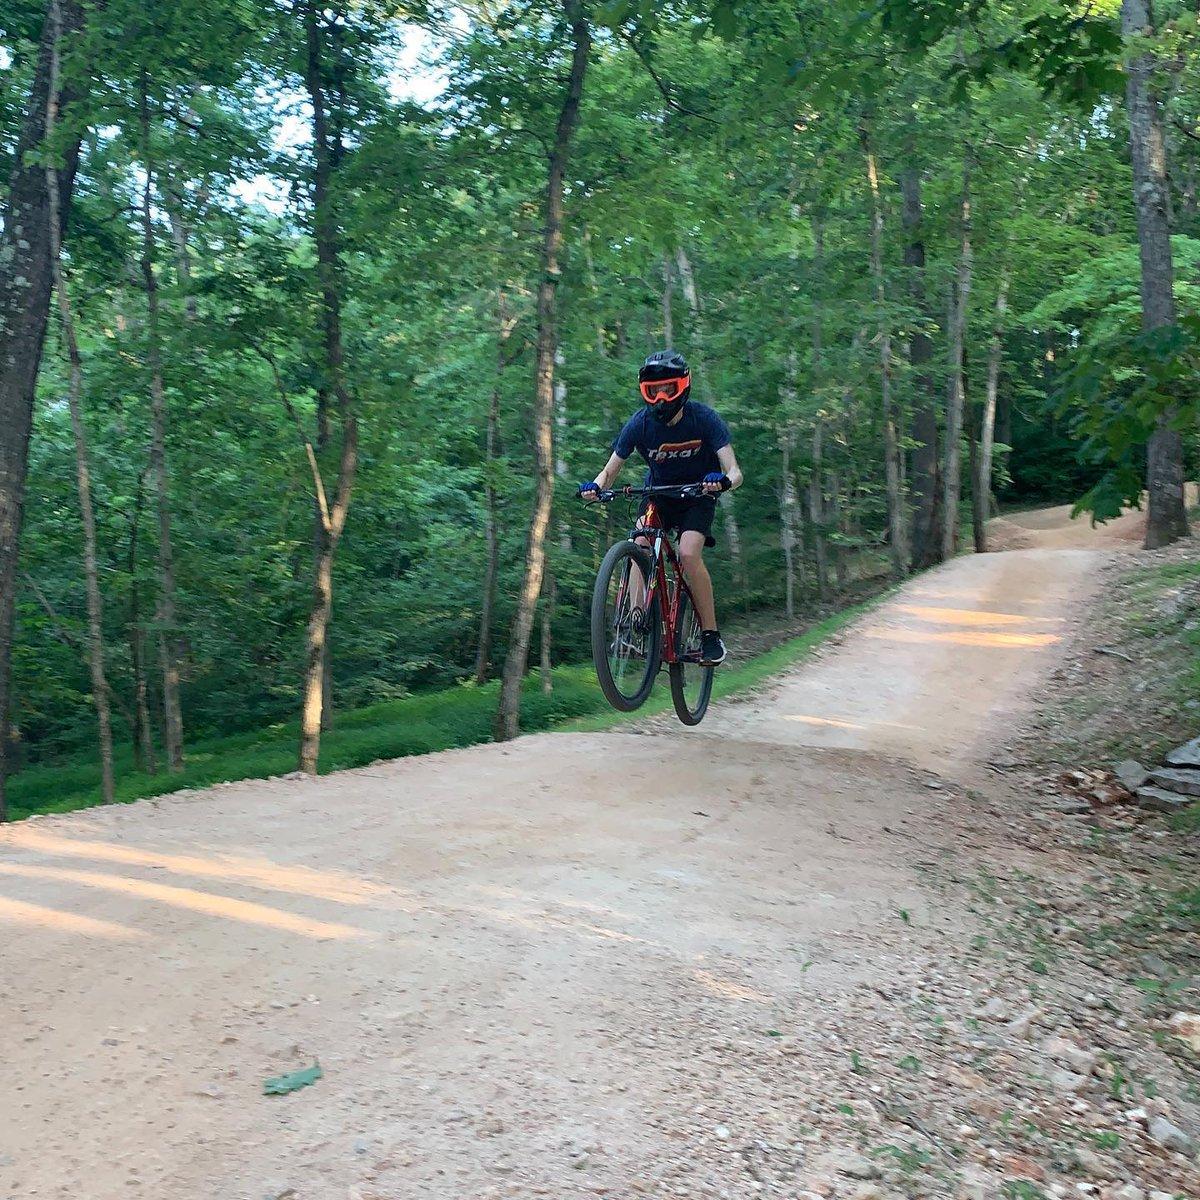 Joshua is out enjoying some Bentonville trails!   #visitbentonville #bikebentonville #bentonvillear #oztrailsnwa https://t.co/dBclVjMAfq